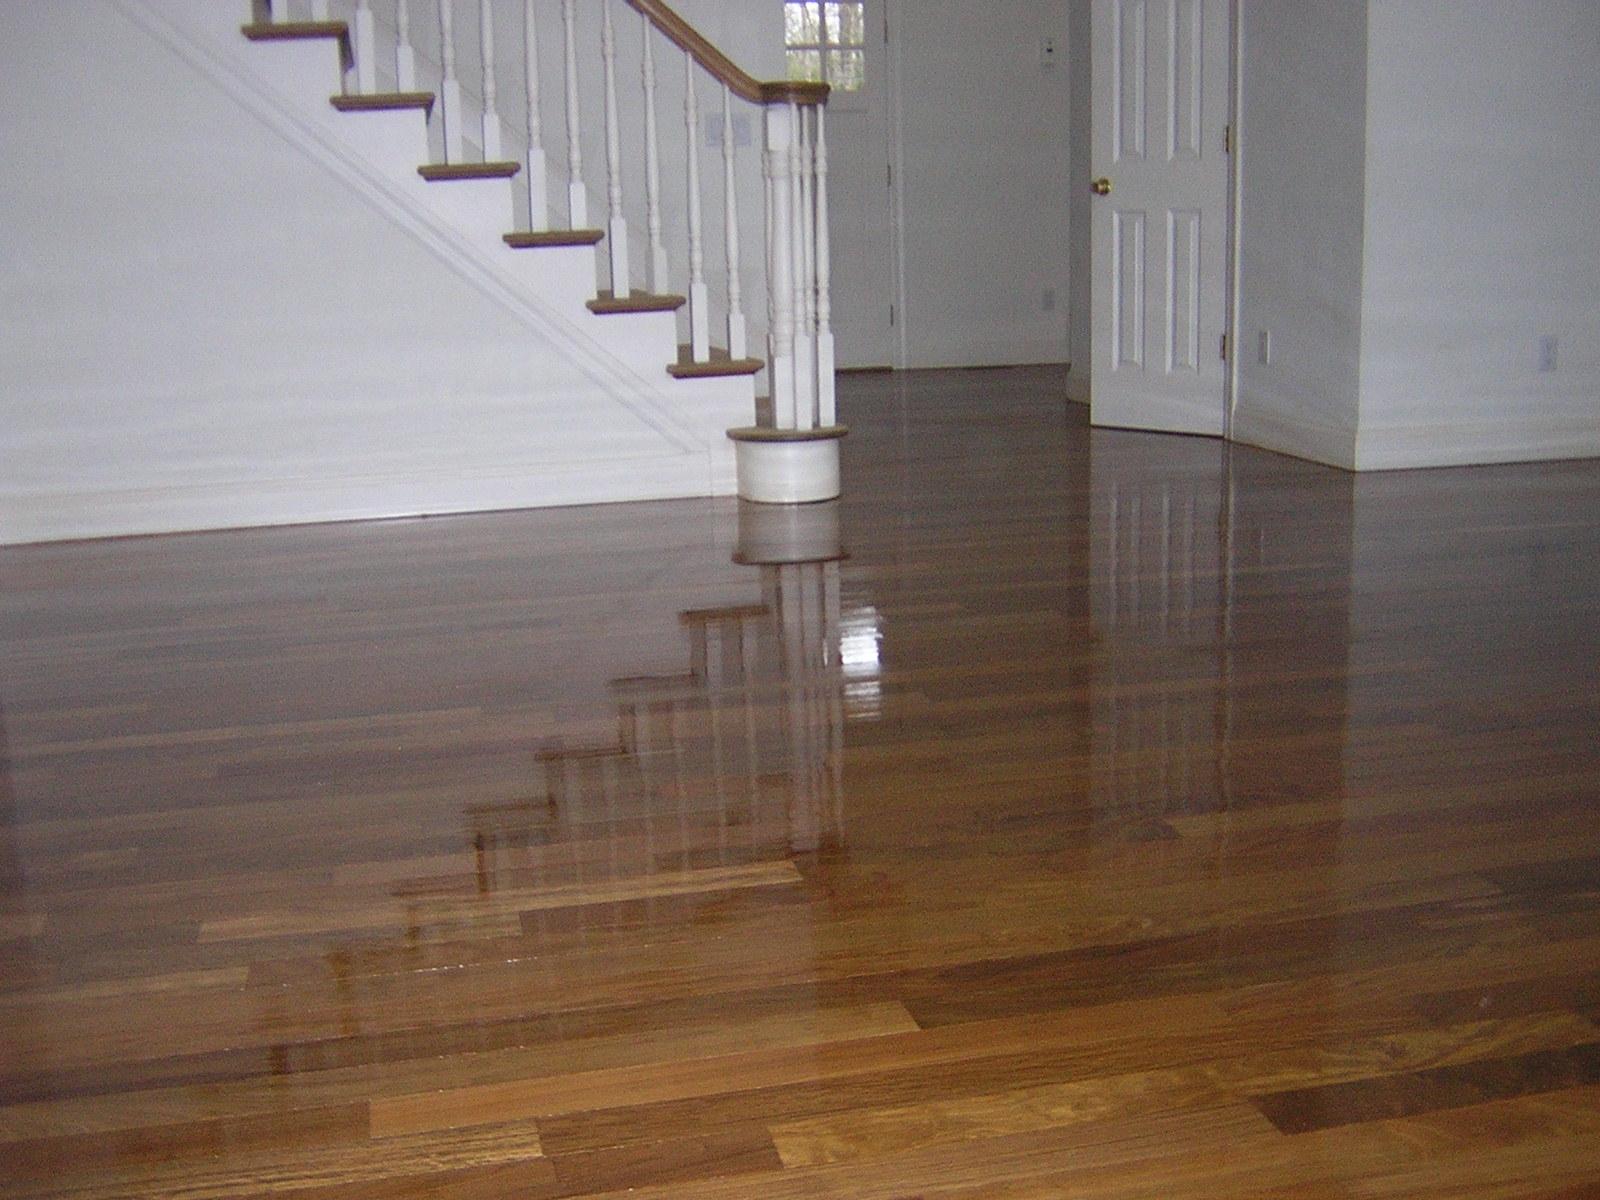 Stylish Floors N' More Inc image 1